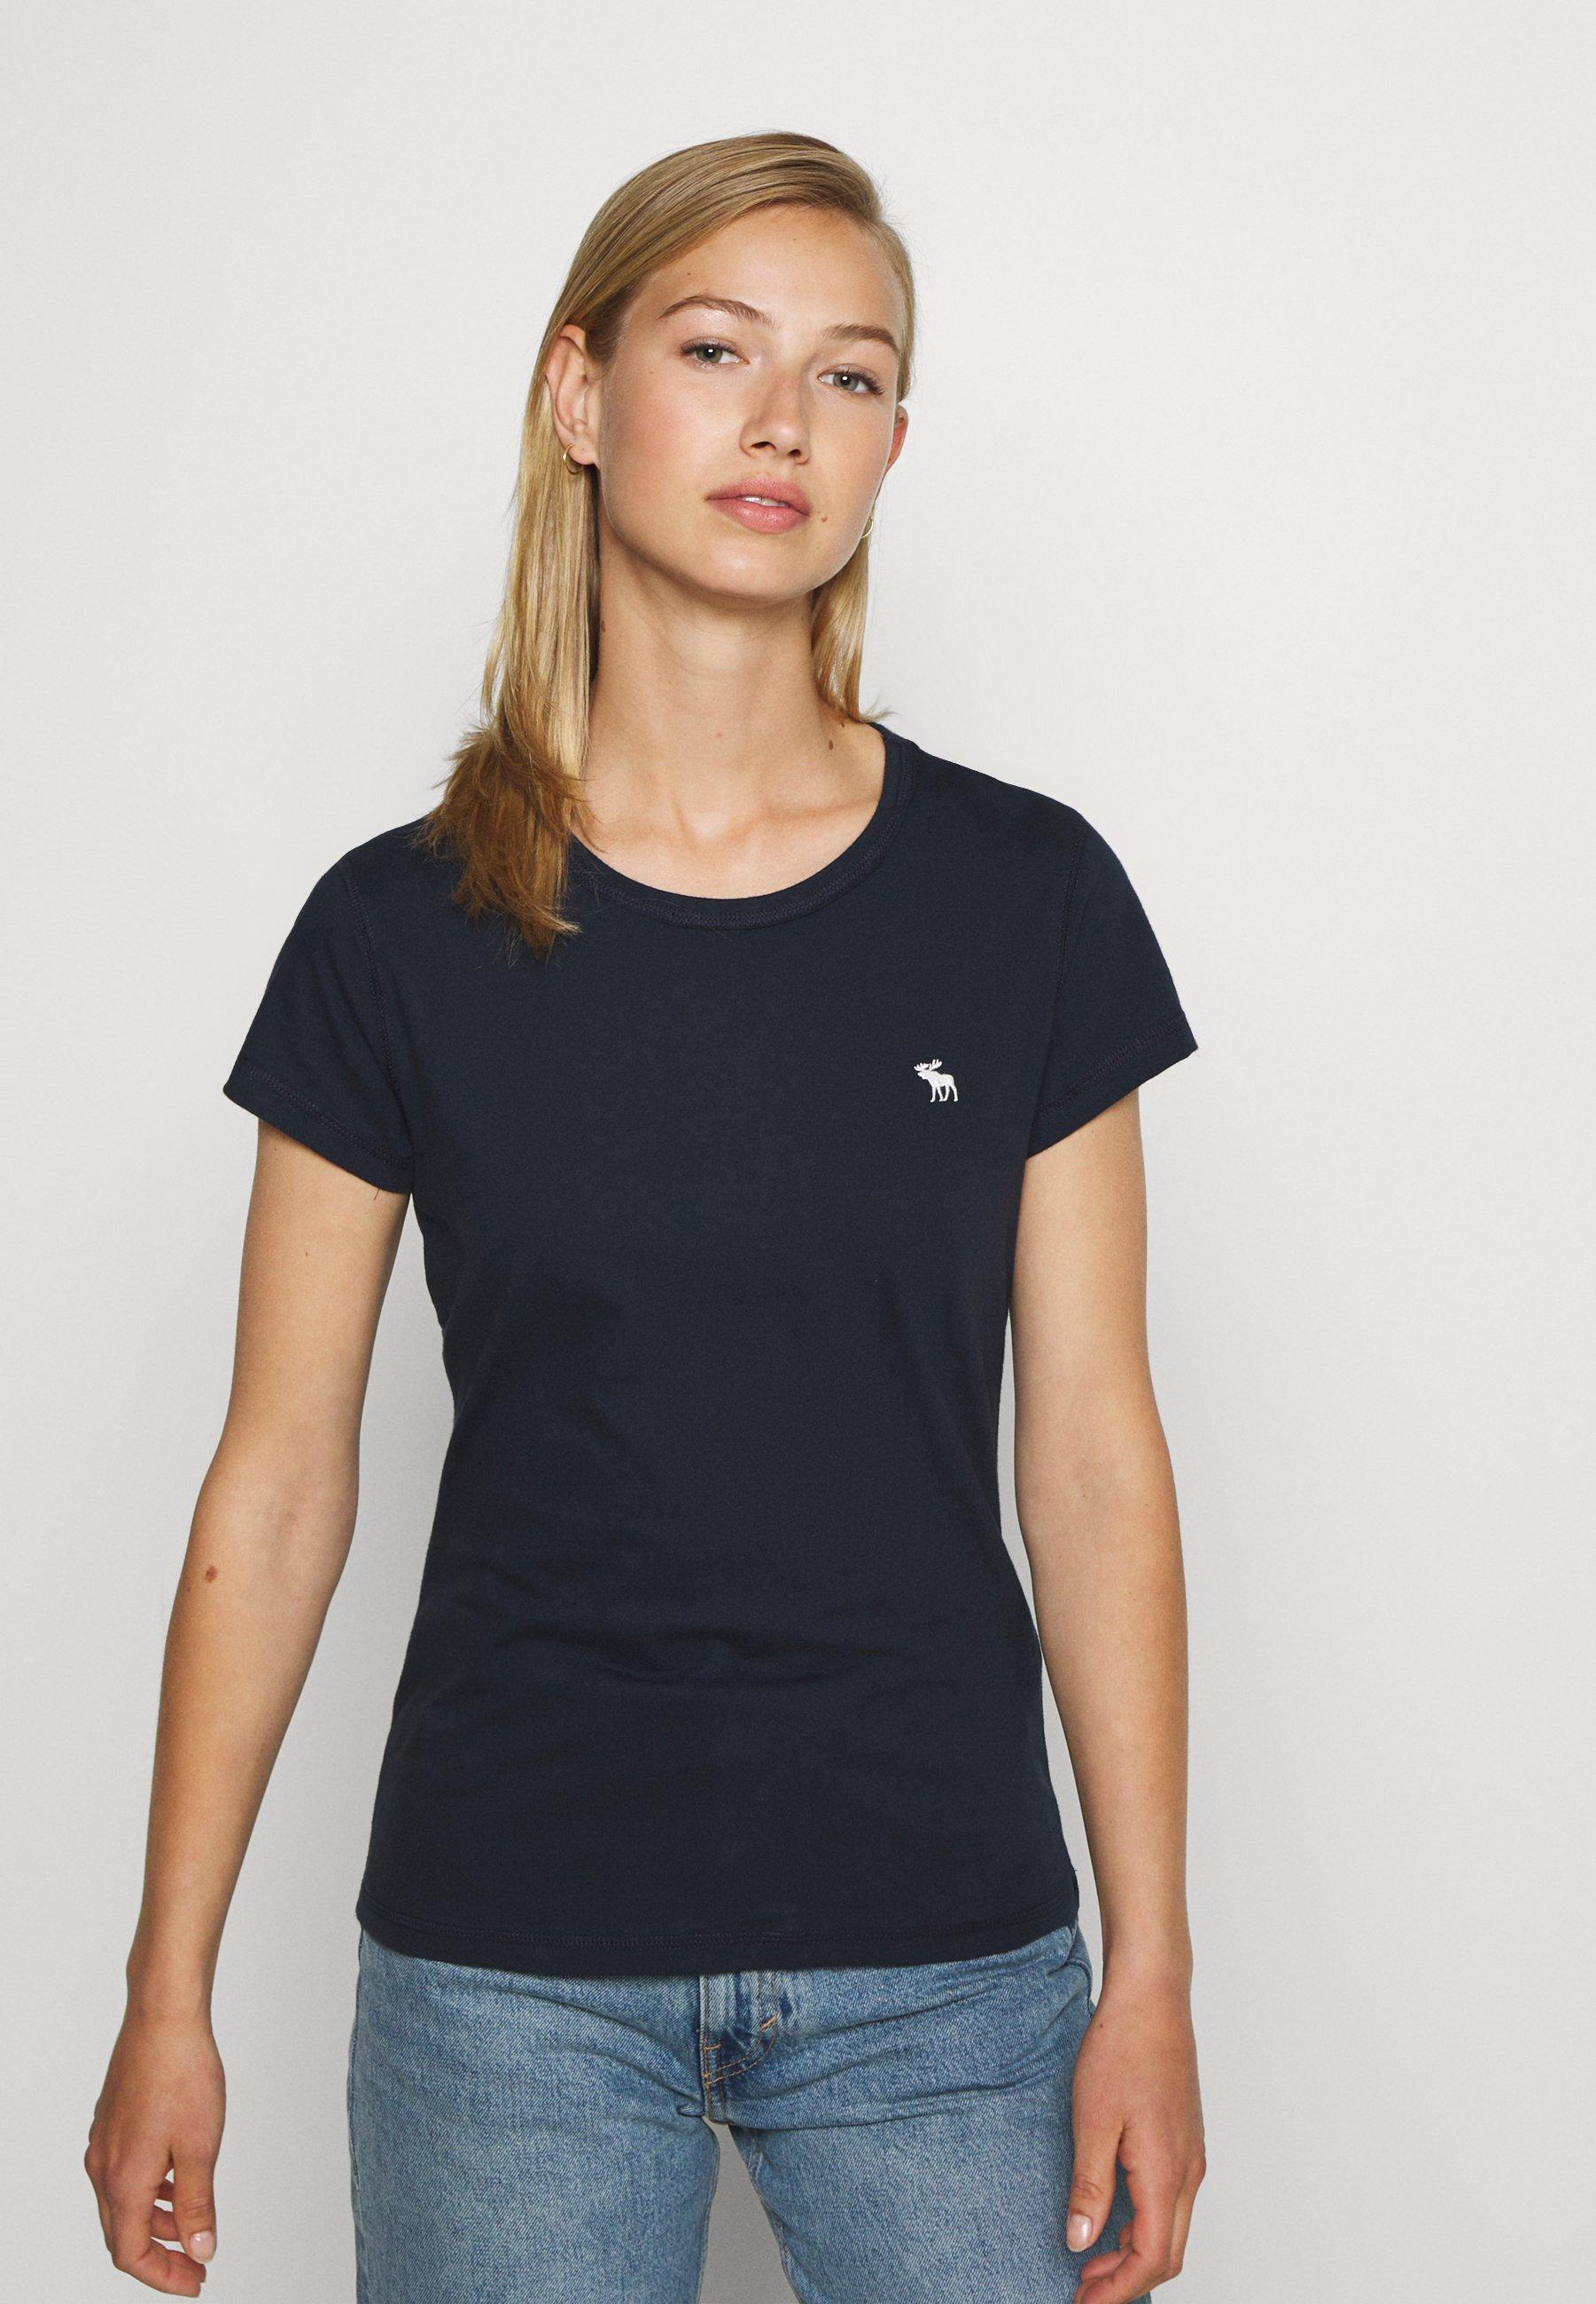 Abercrombie & Fitch CREW 3 PACK - T-shirt basic - black/white/navy - Abbigliamento da donna Sbrigati